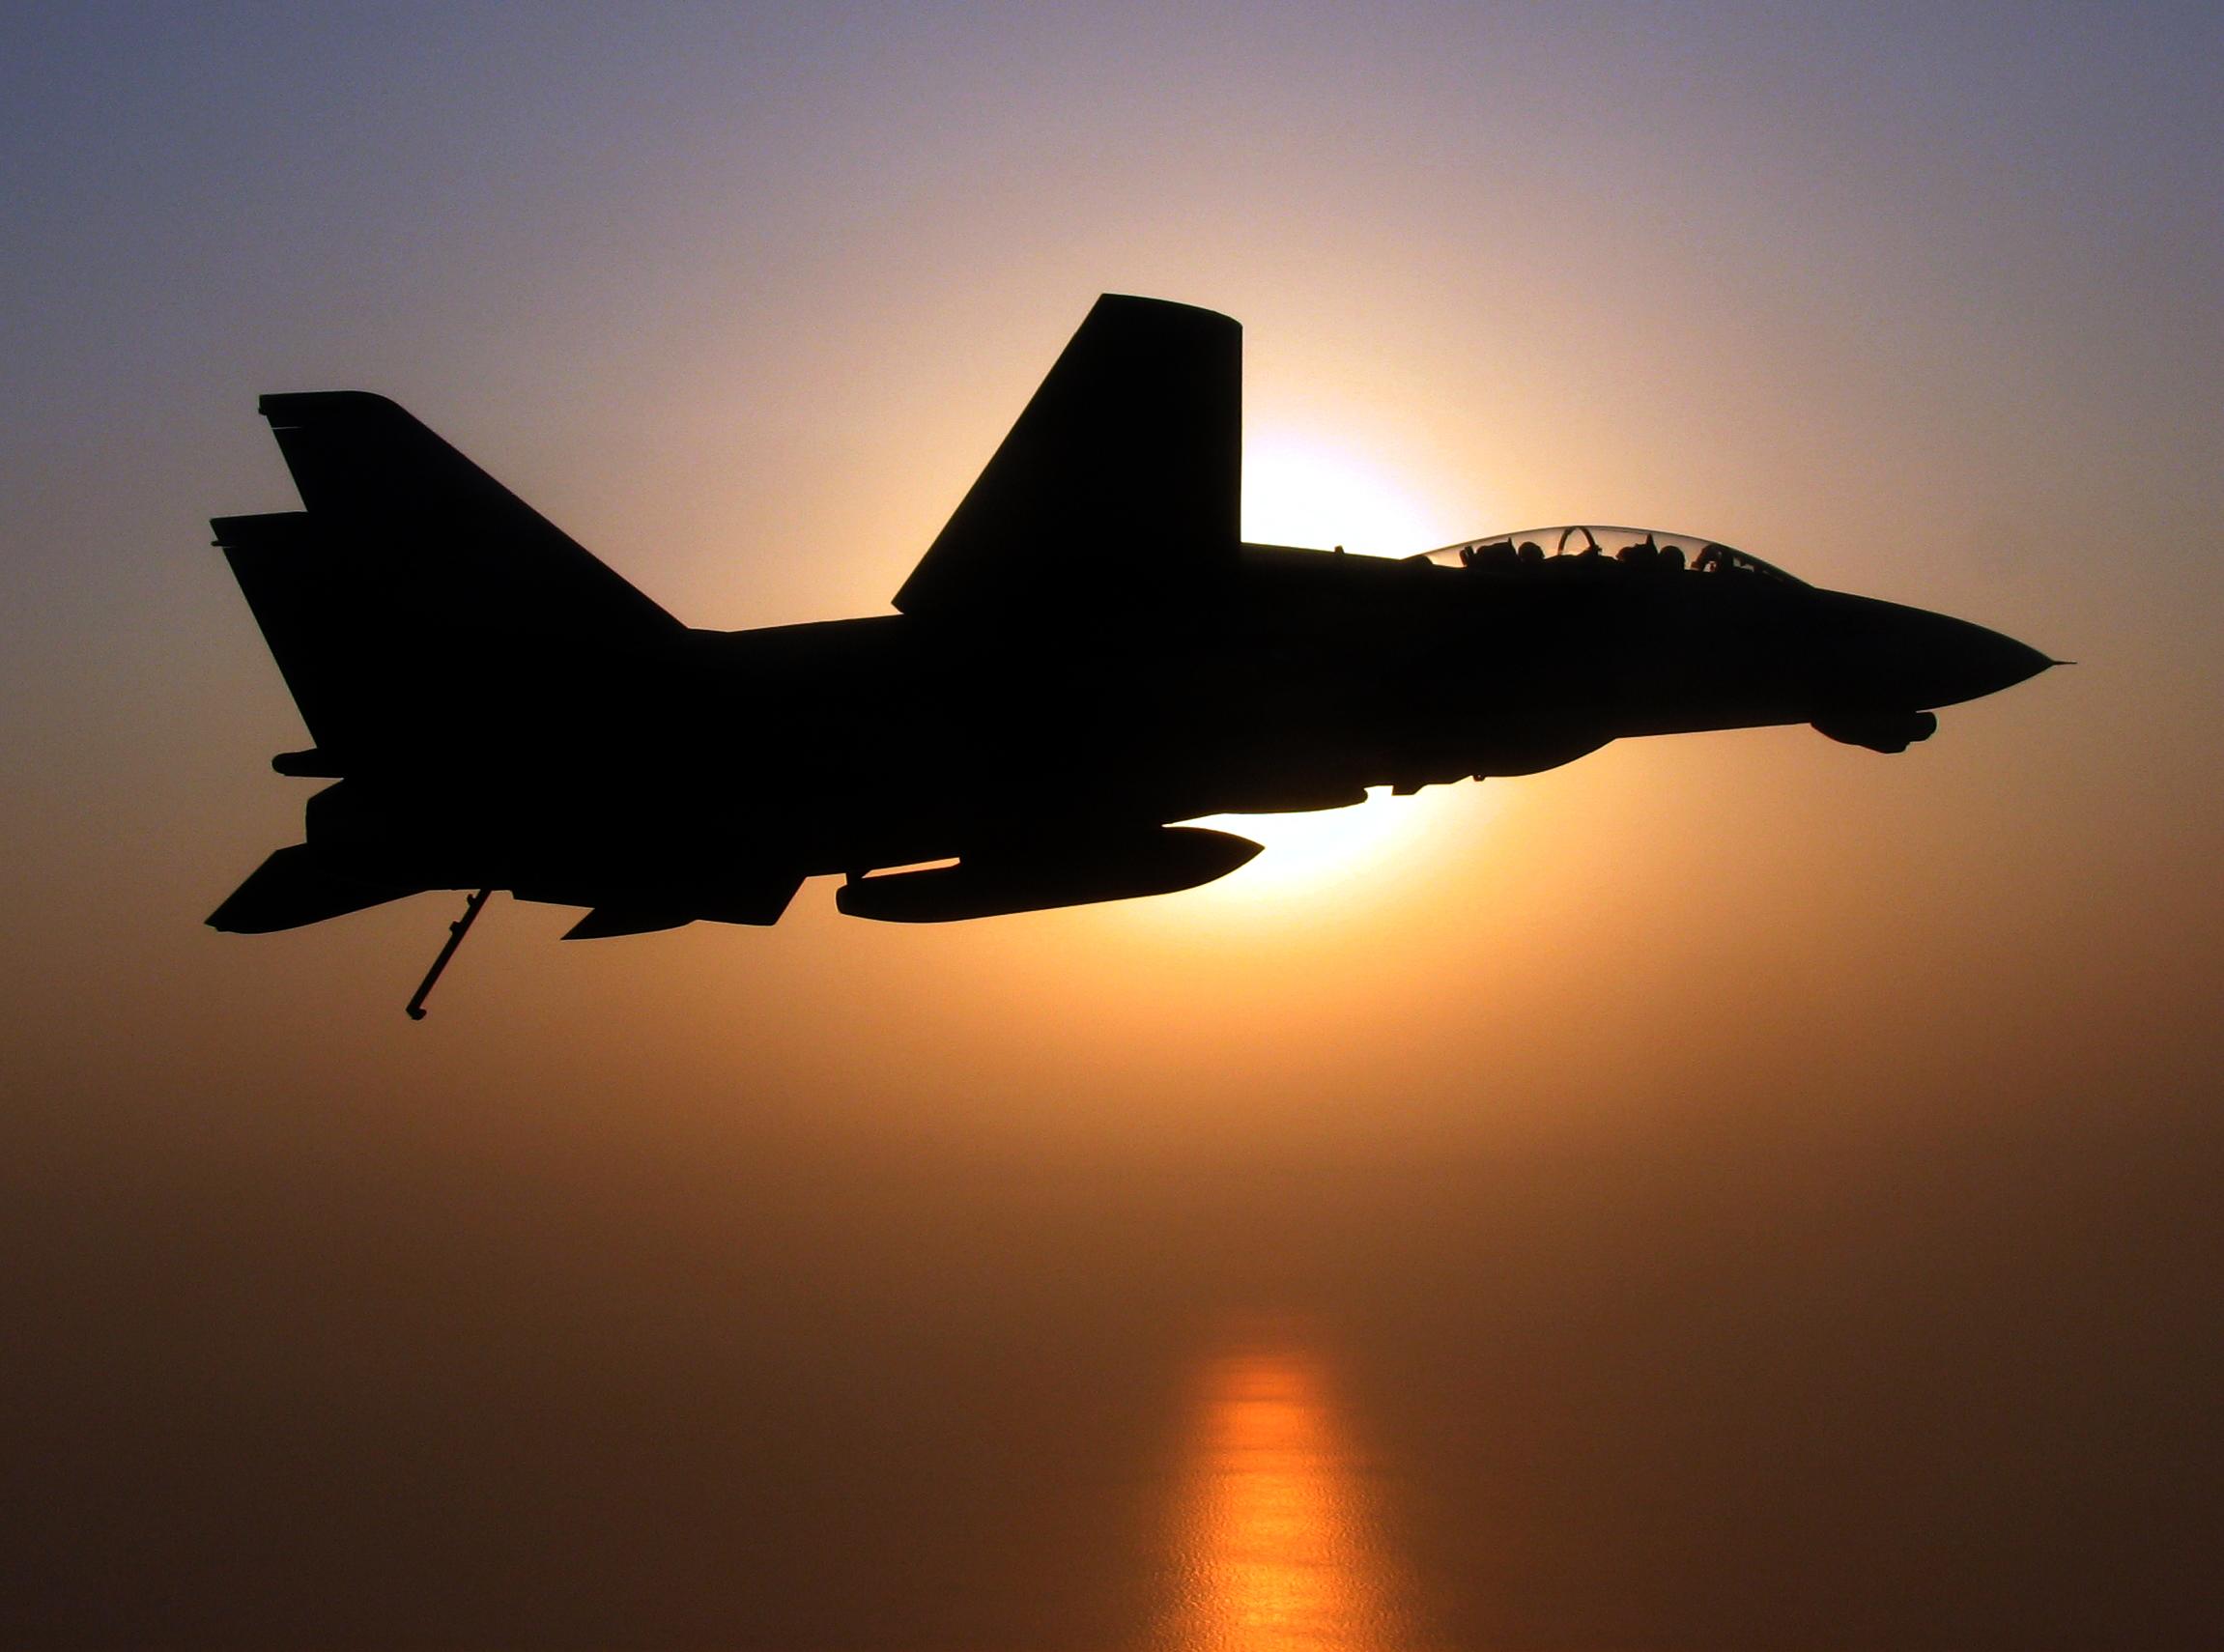 F 14 (戦闘機)の画像 p1_38